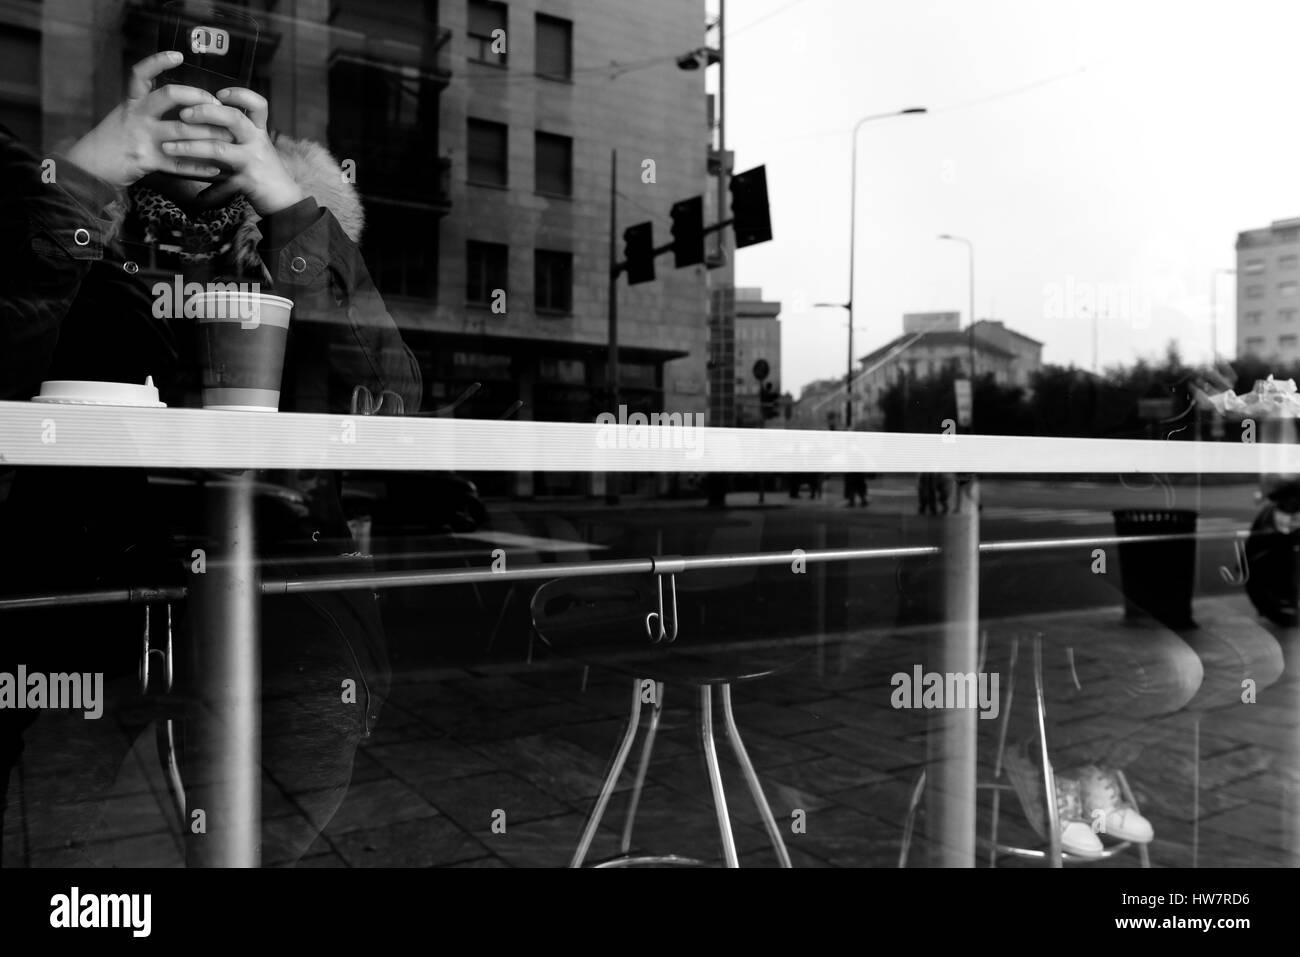 Window reflections. Mobile phone use - Stock Image